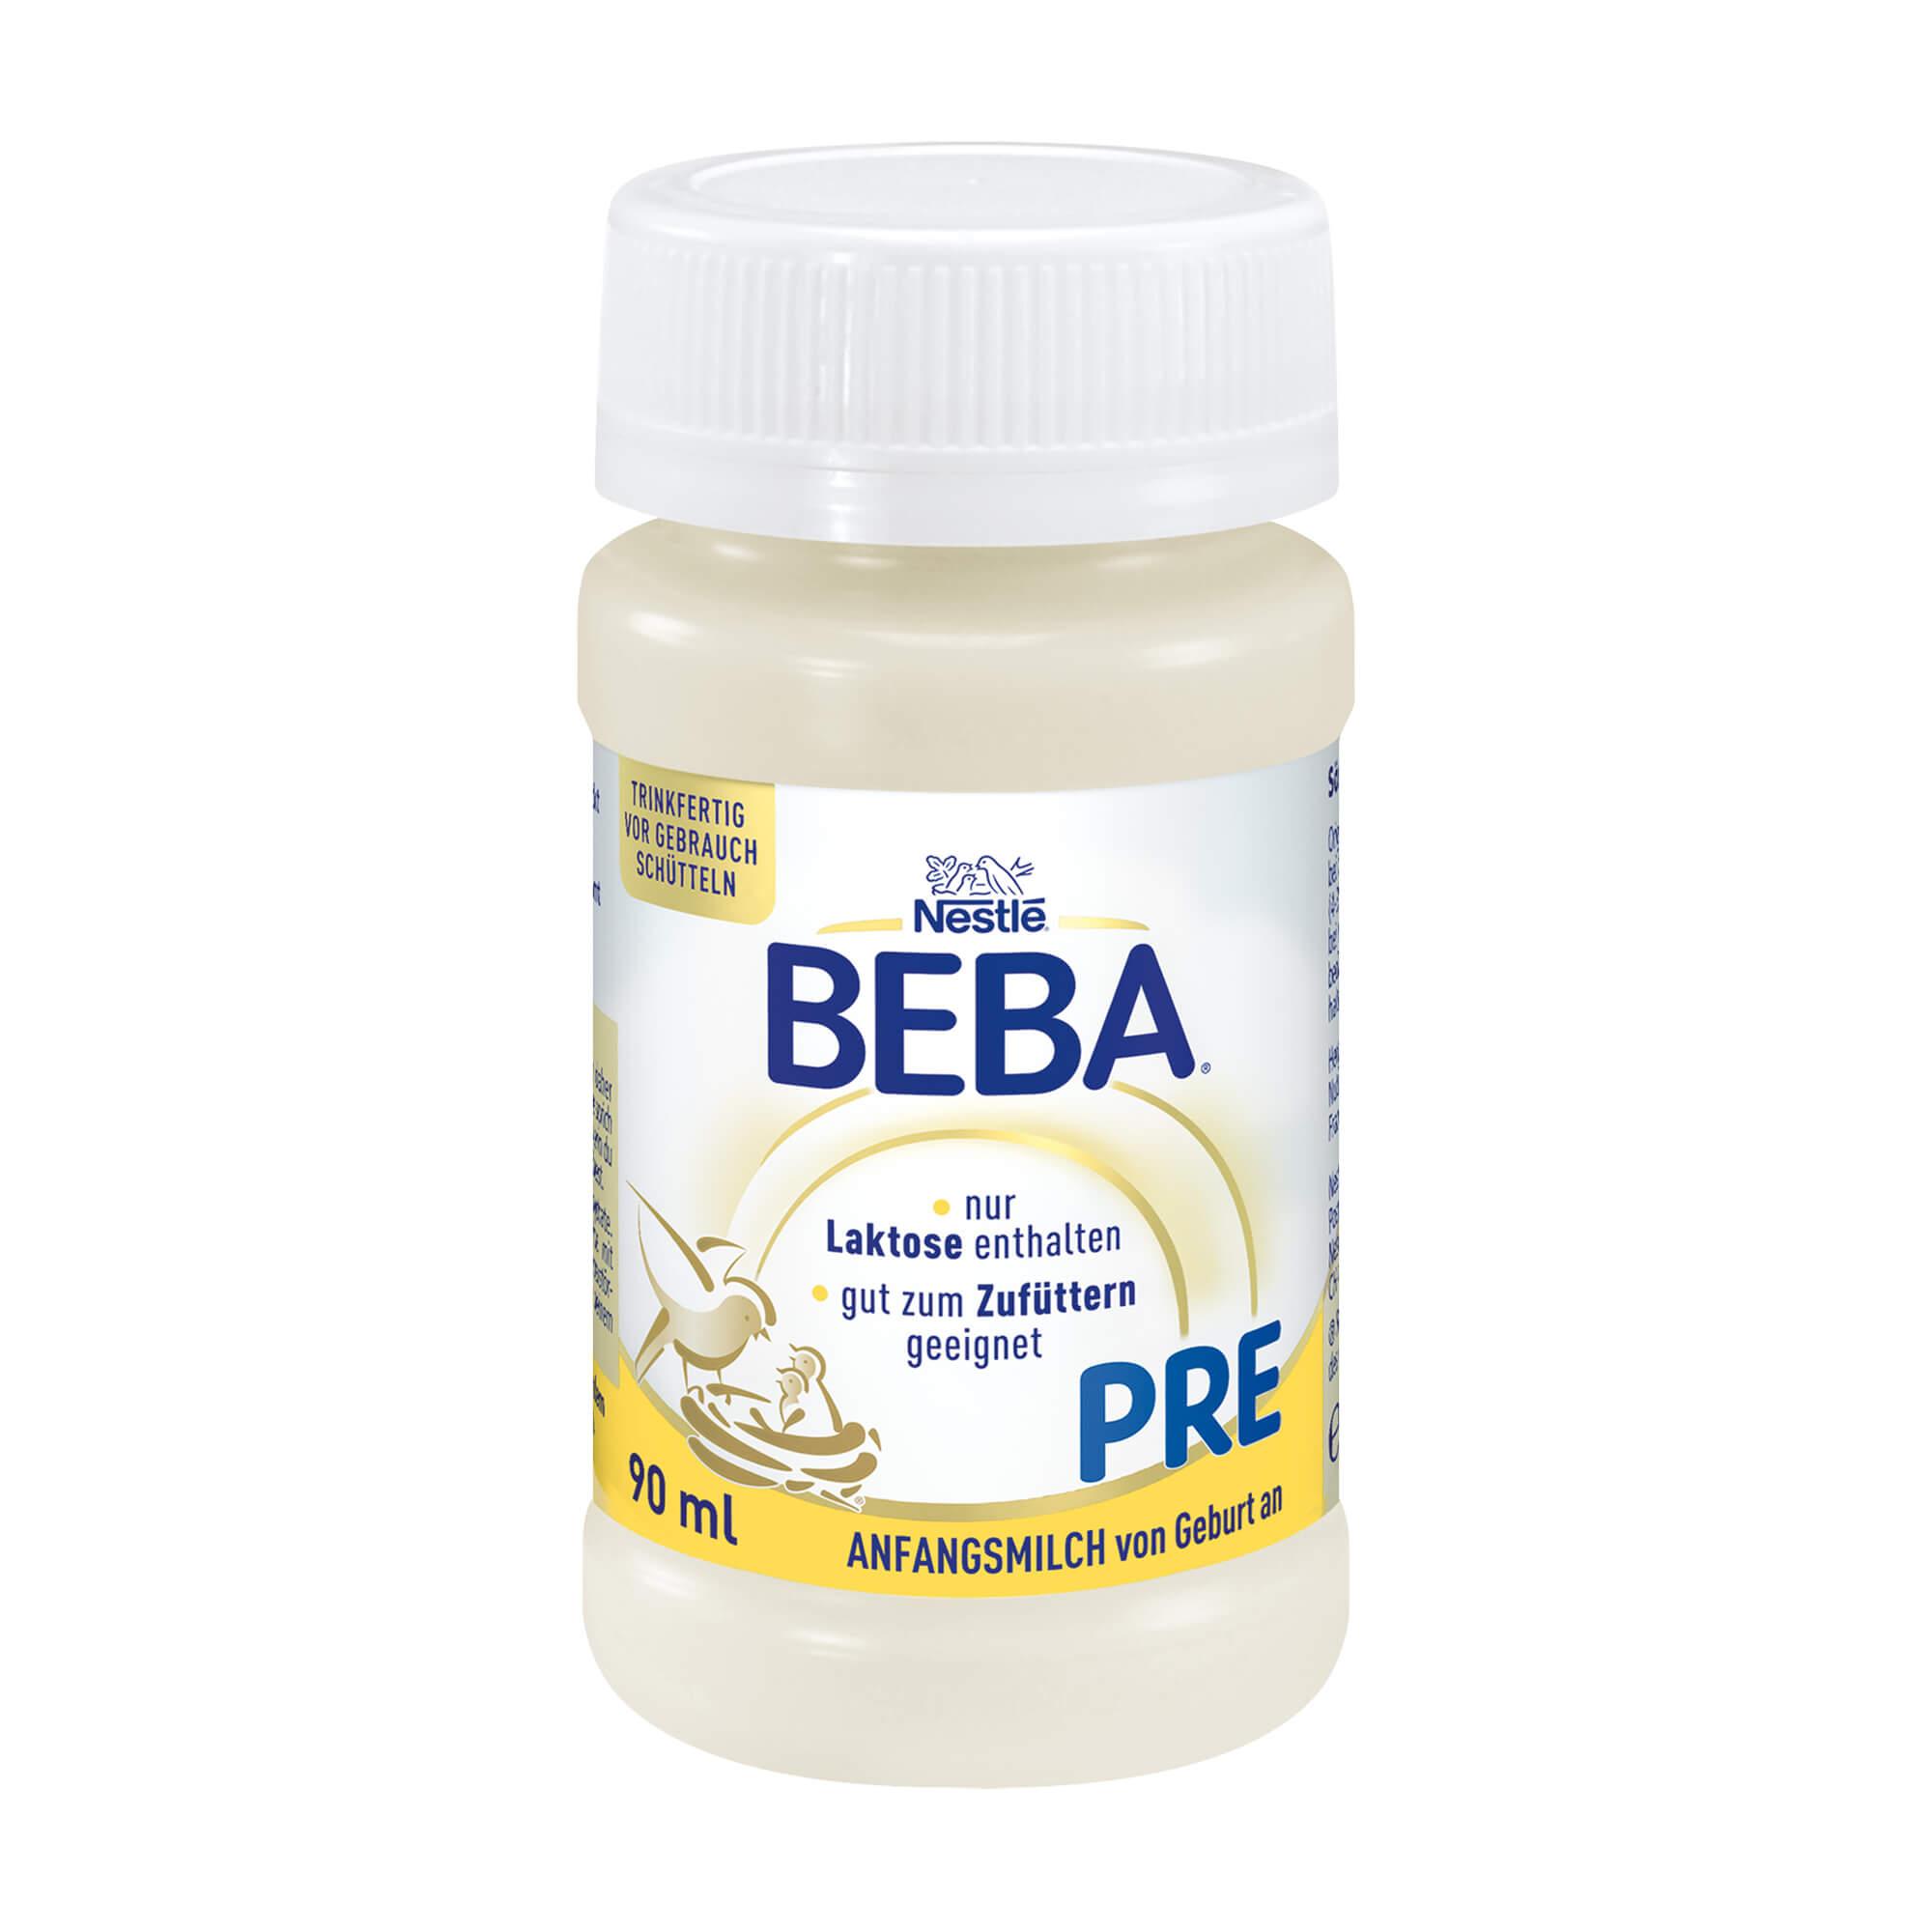 Nestle BEBA Pre flüssig